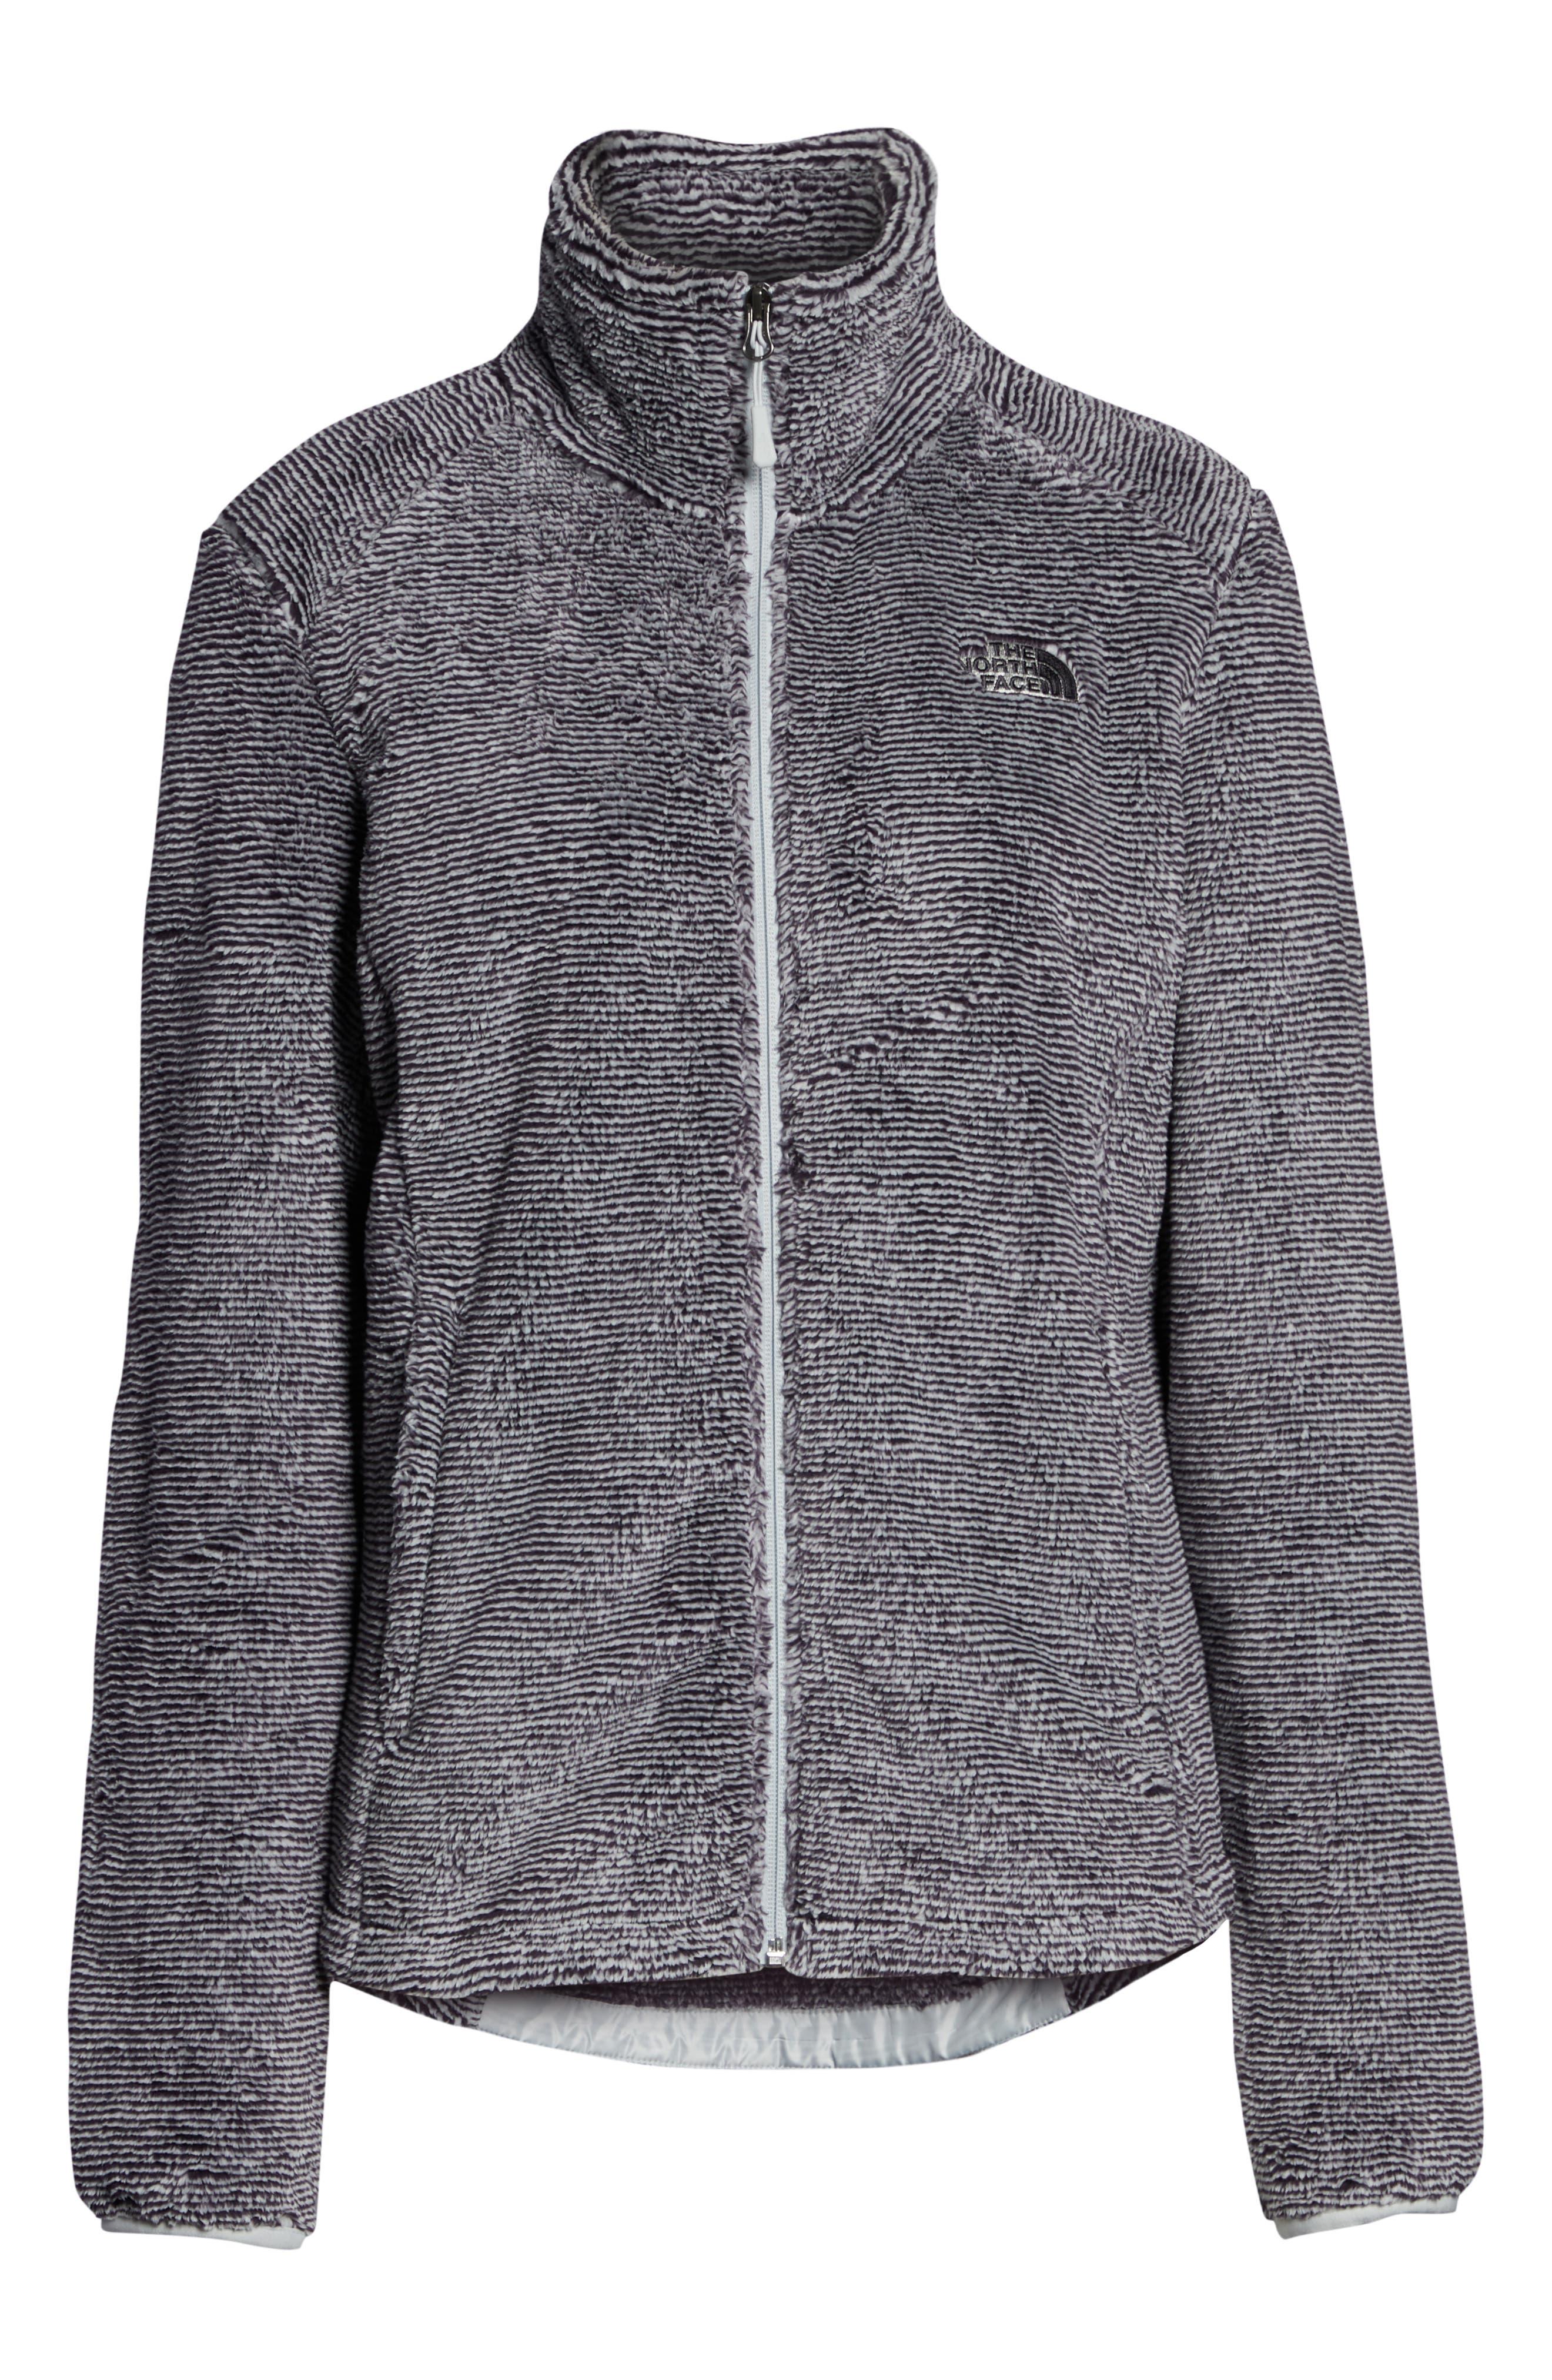 THE NORTH FACE, Osito 2 Stripe Fleece Jacket, Alternate thumbnail 6, color, BLACK/ TIN GREY STRIPE